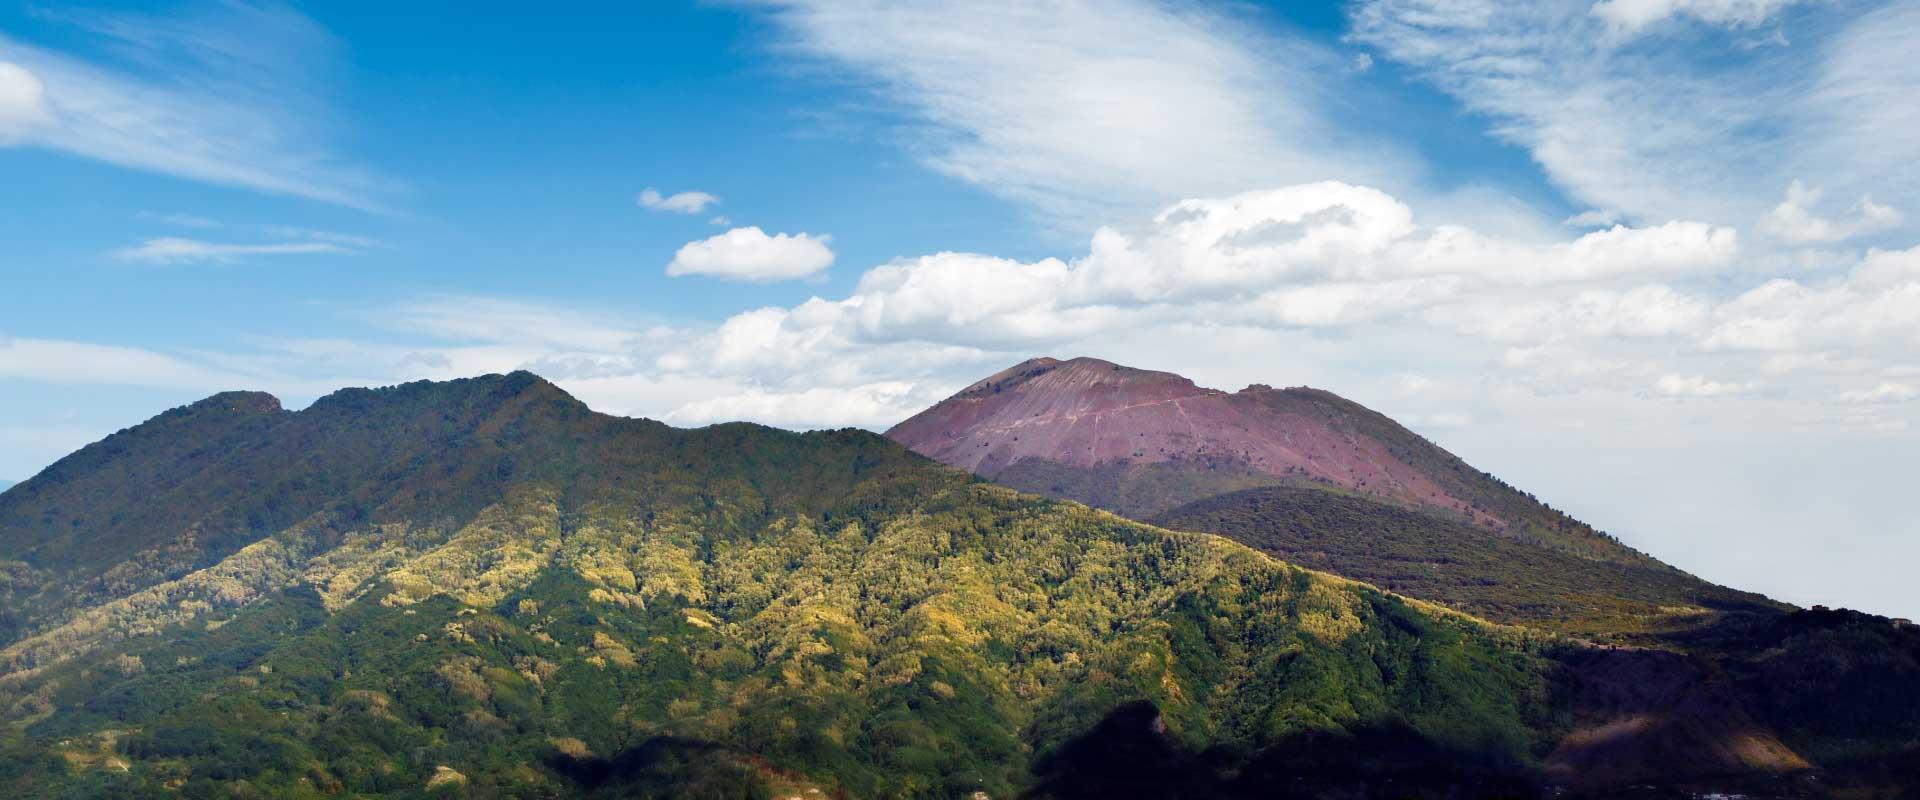 Ente Parco Nazionale del Vesuvio